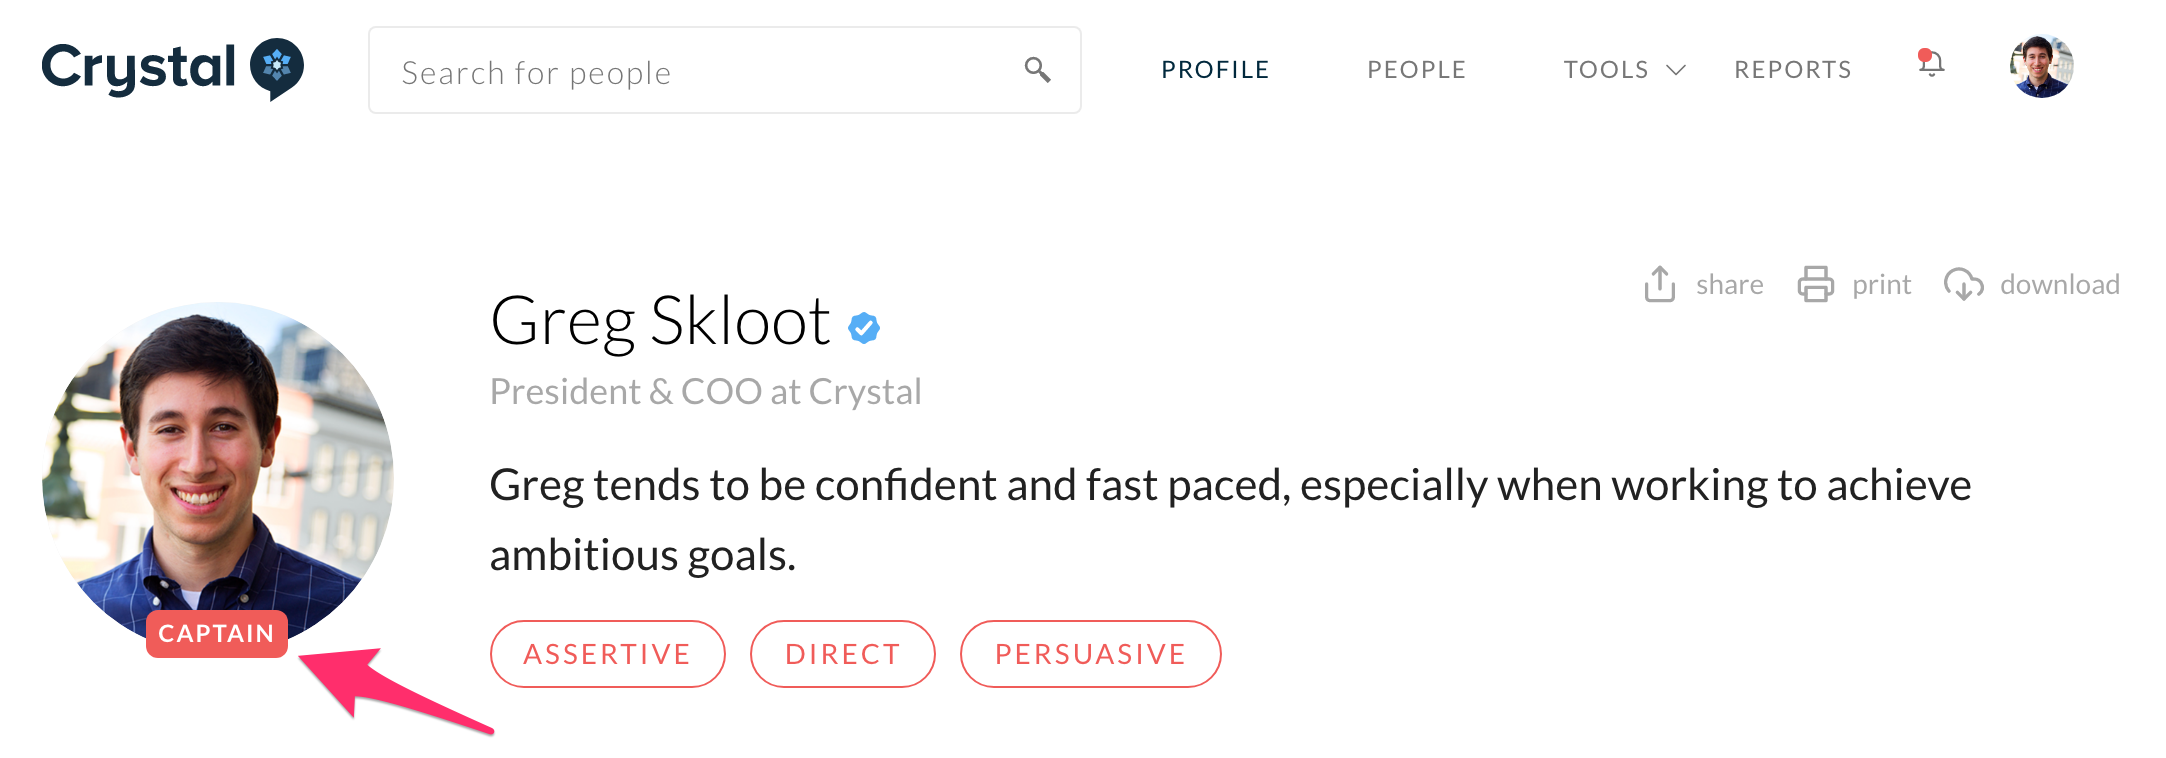 Crystal_-_Profile